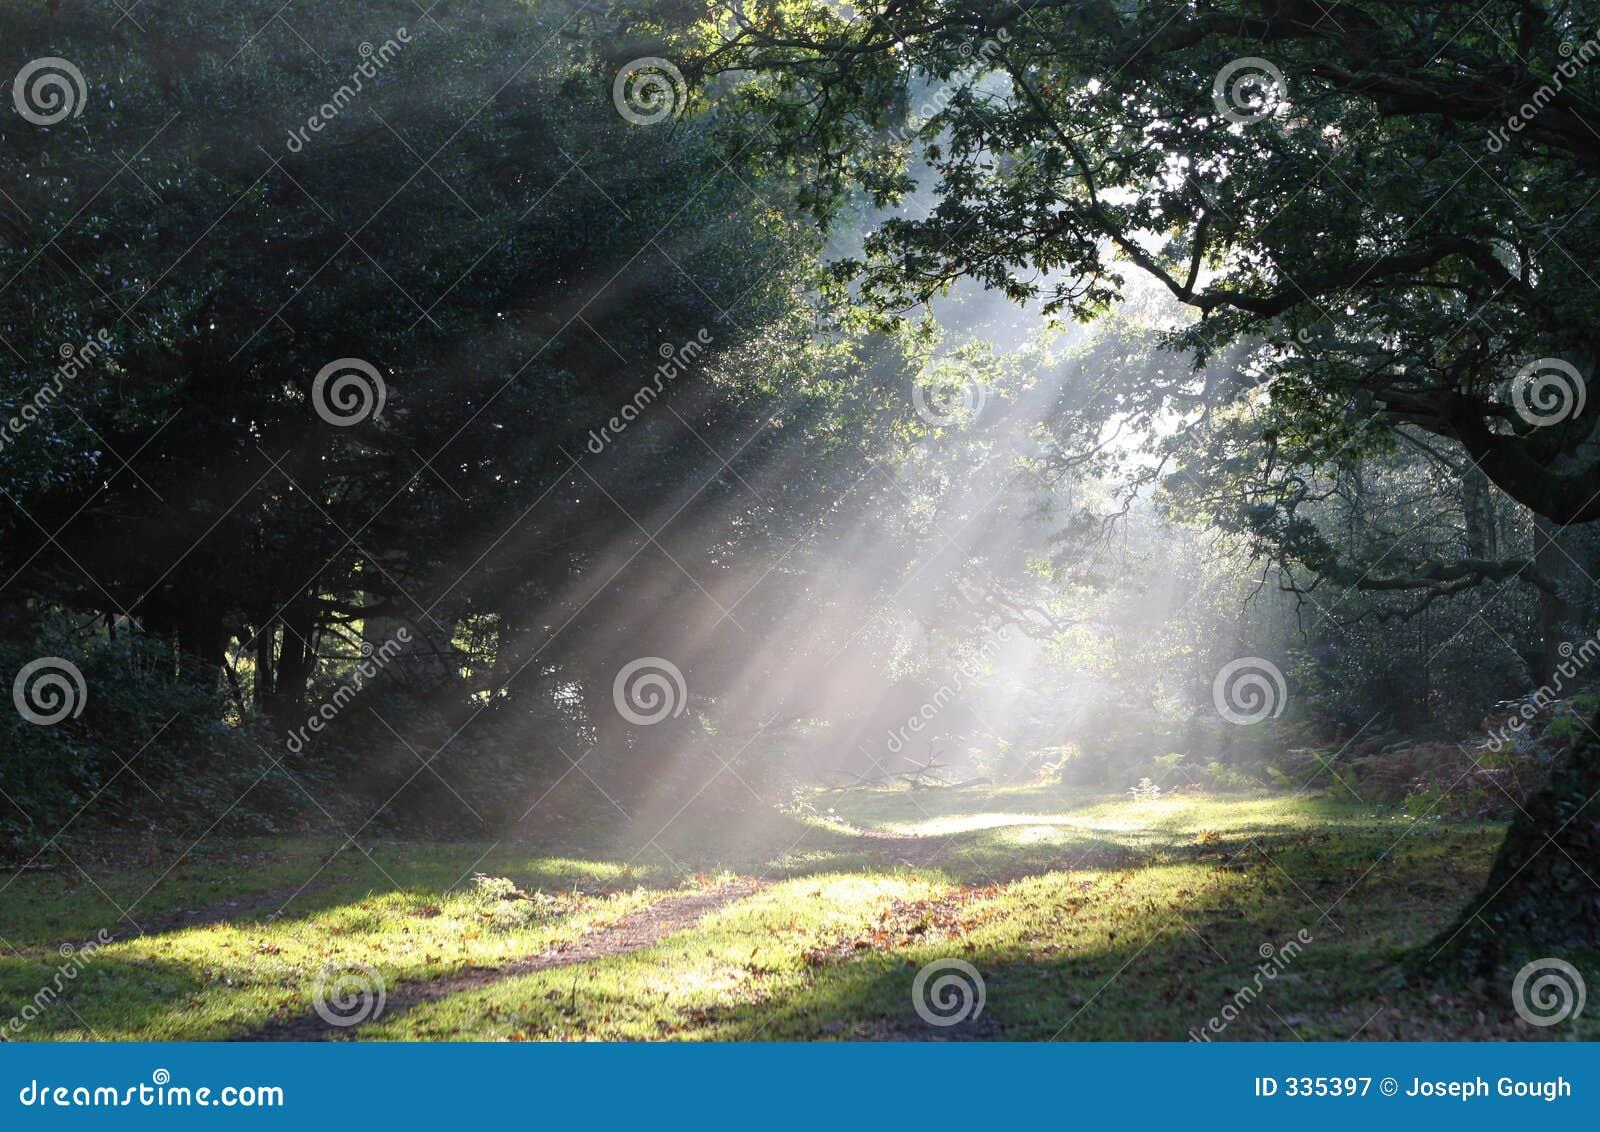 Clairi Re De For T De Brouillard De Lumi Re Du Soleil